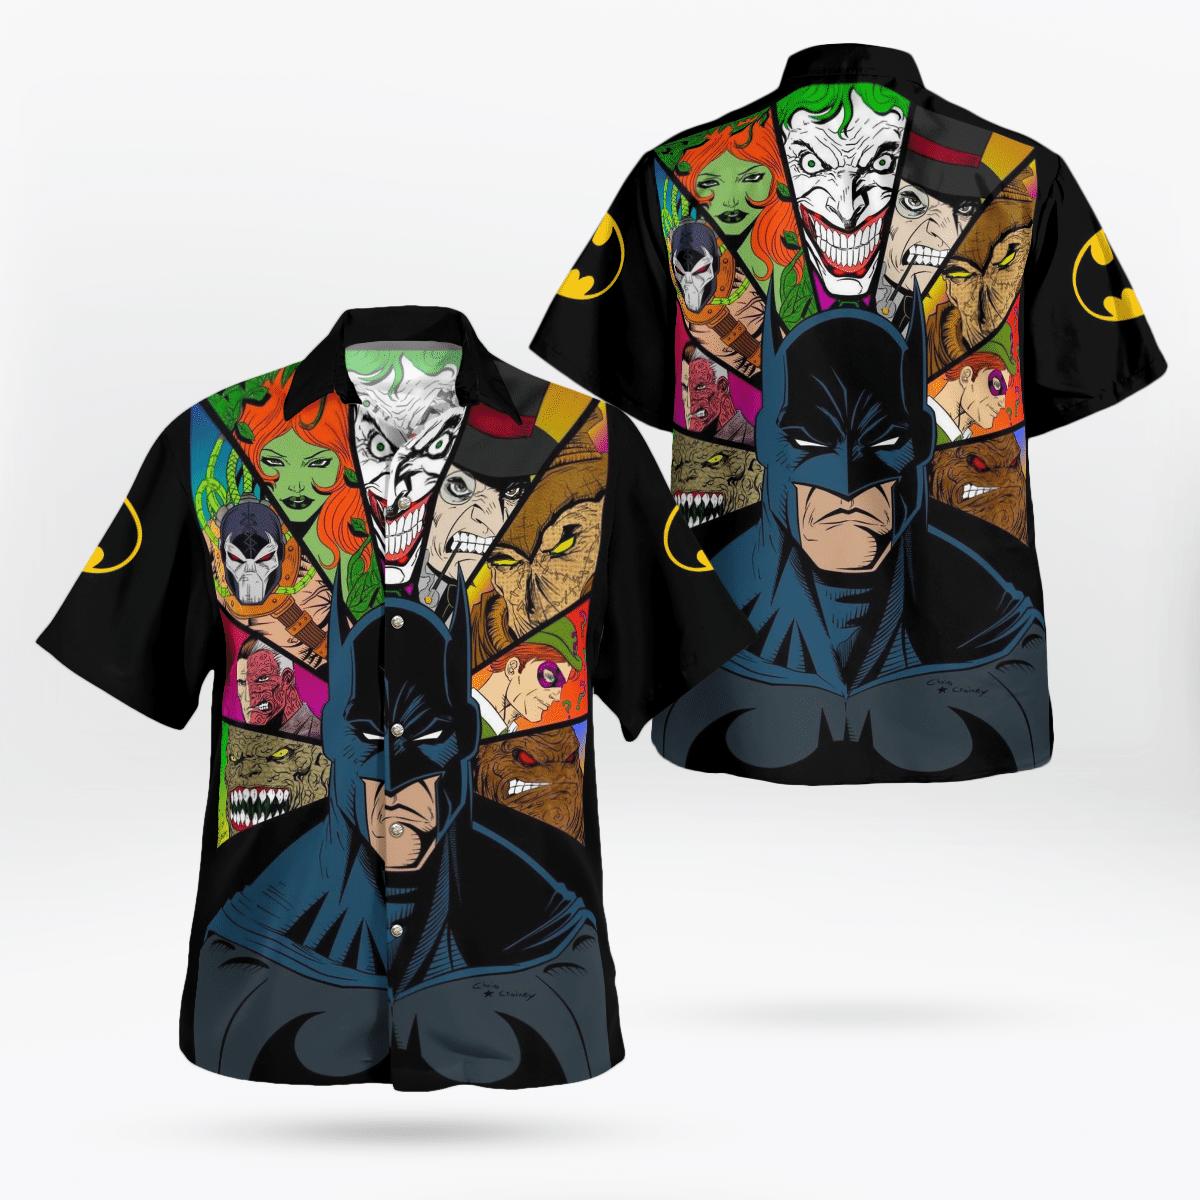 Batman Animated and Villain Face Hawaiian Shirt